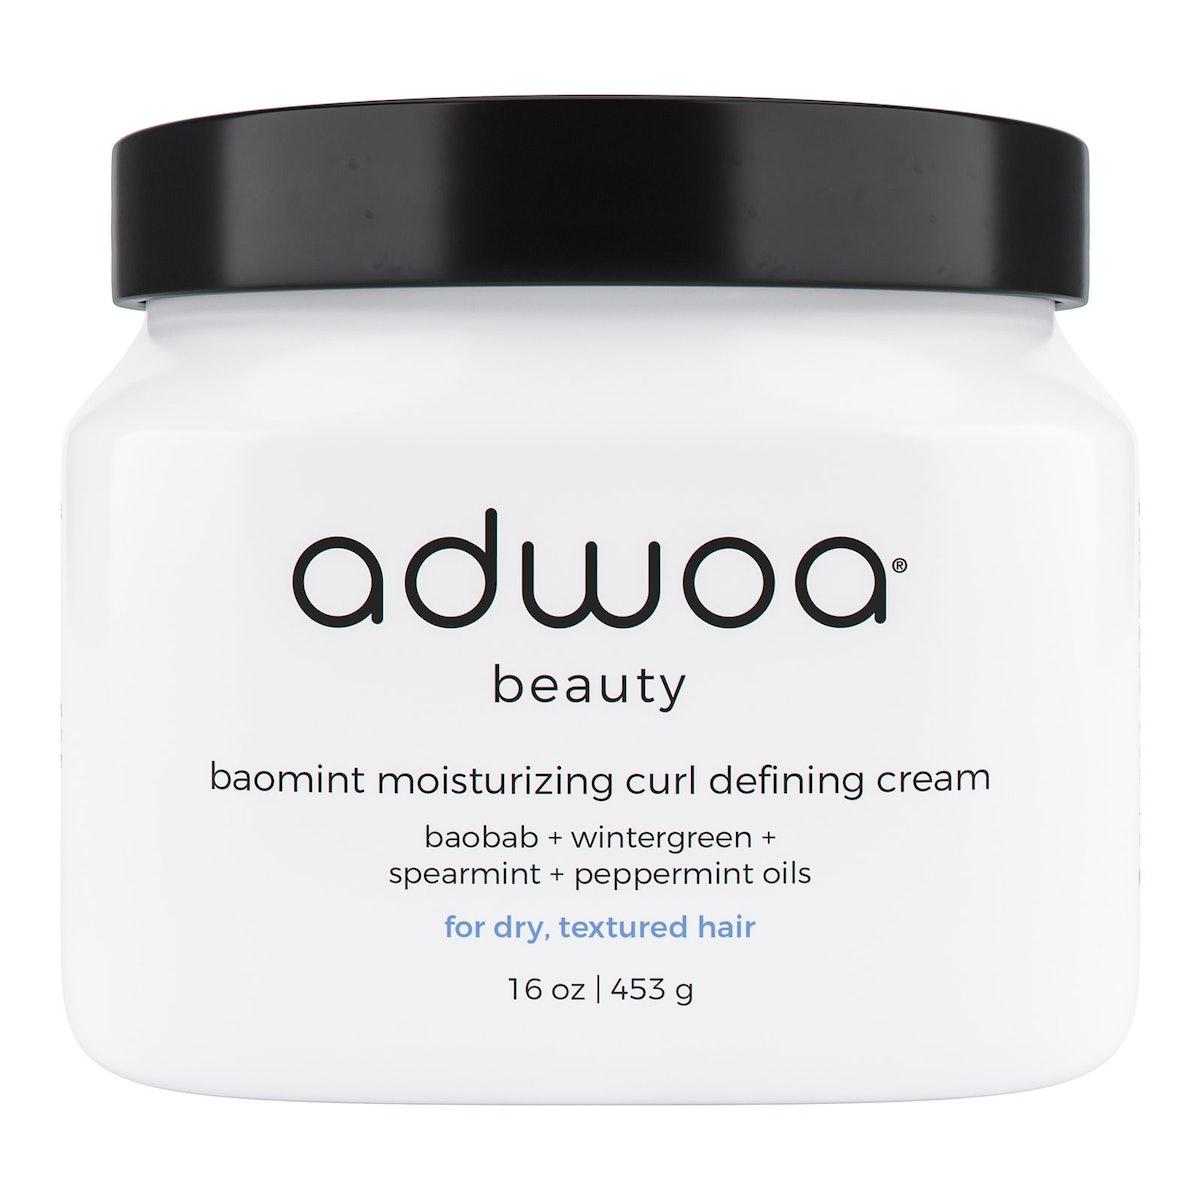 Baomint Moisturizing Curl Defining Cream